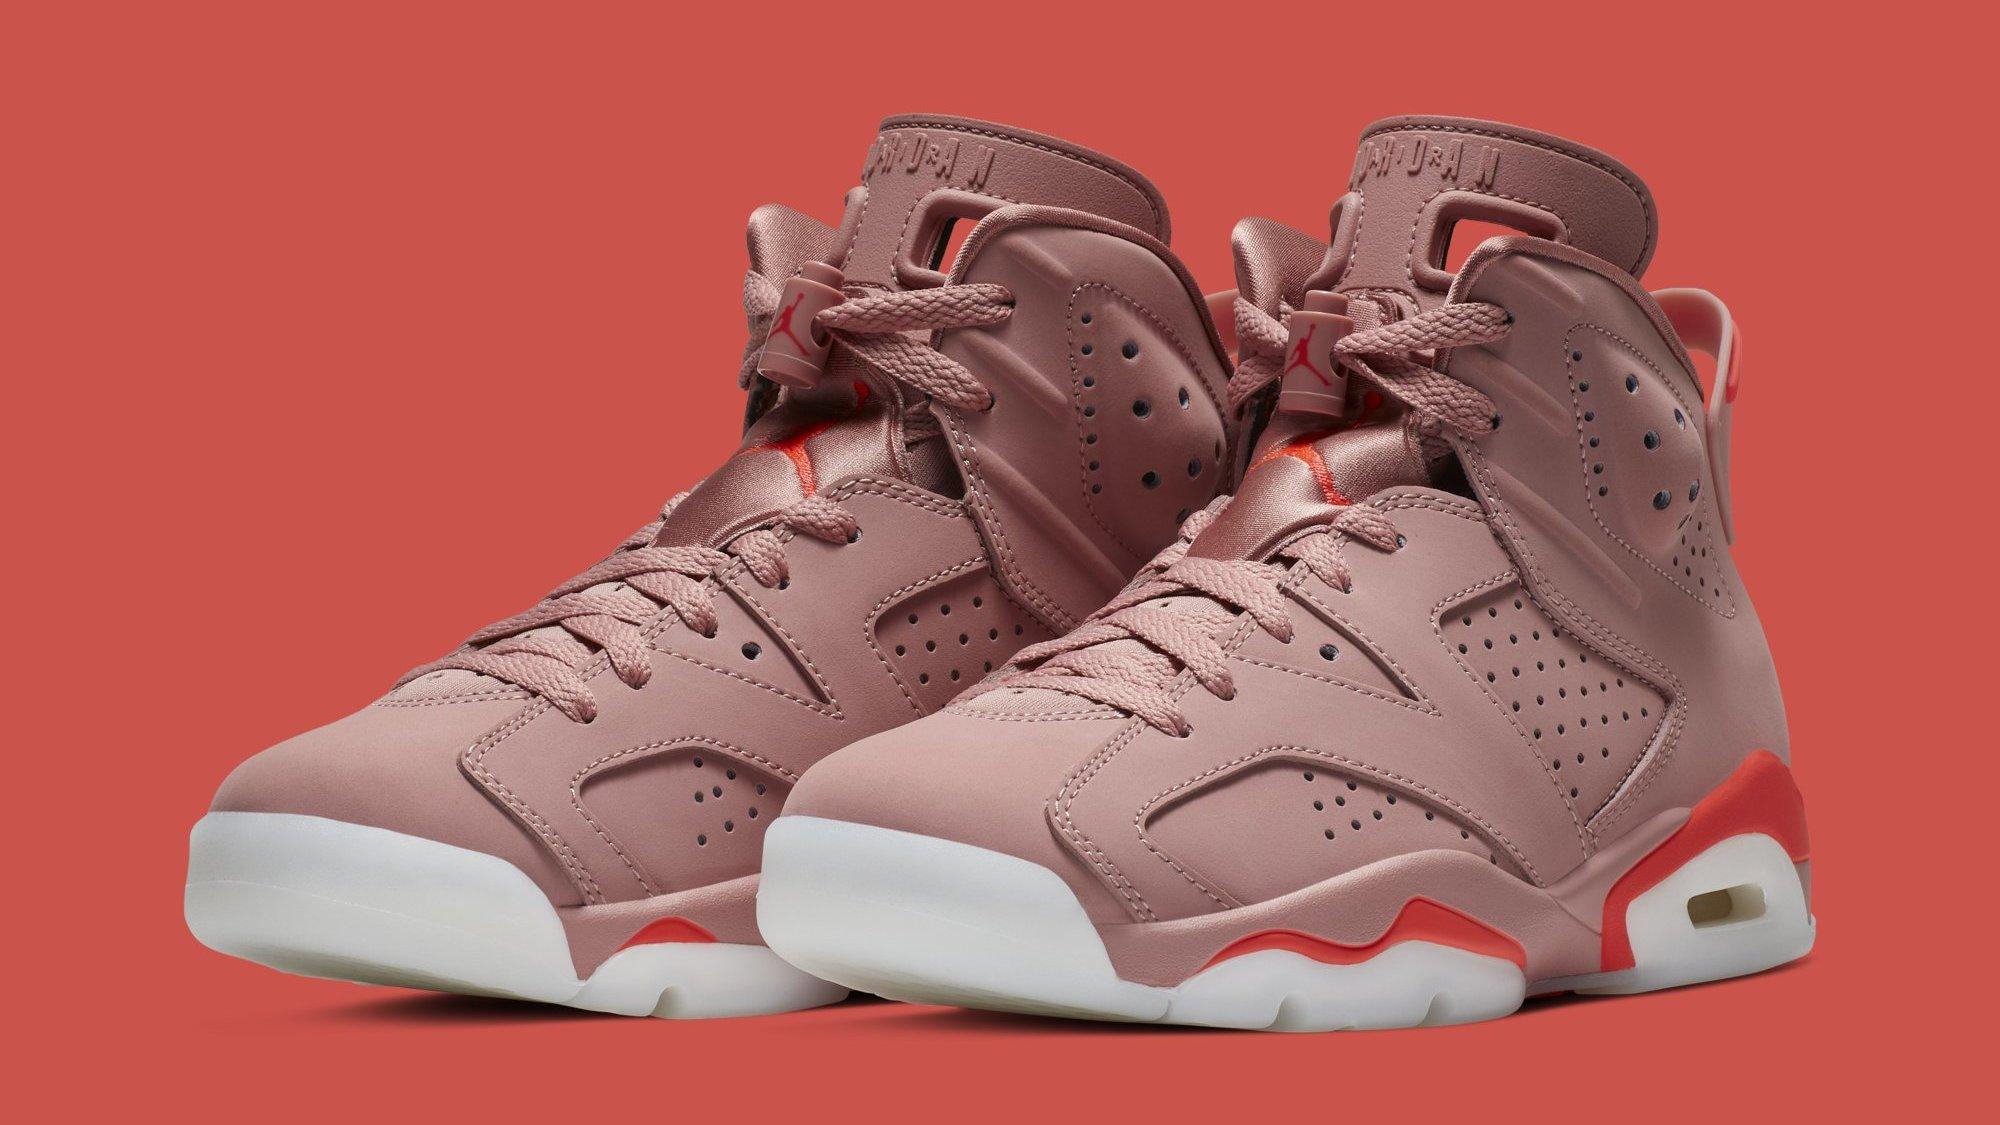 75e52882b84 Aleali May x Air Jordan 6 'Millennial Pink' CI0550-600 Release Date ...